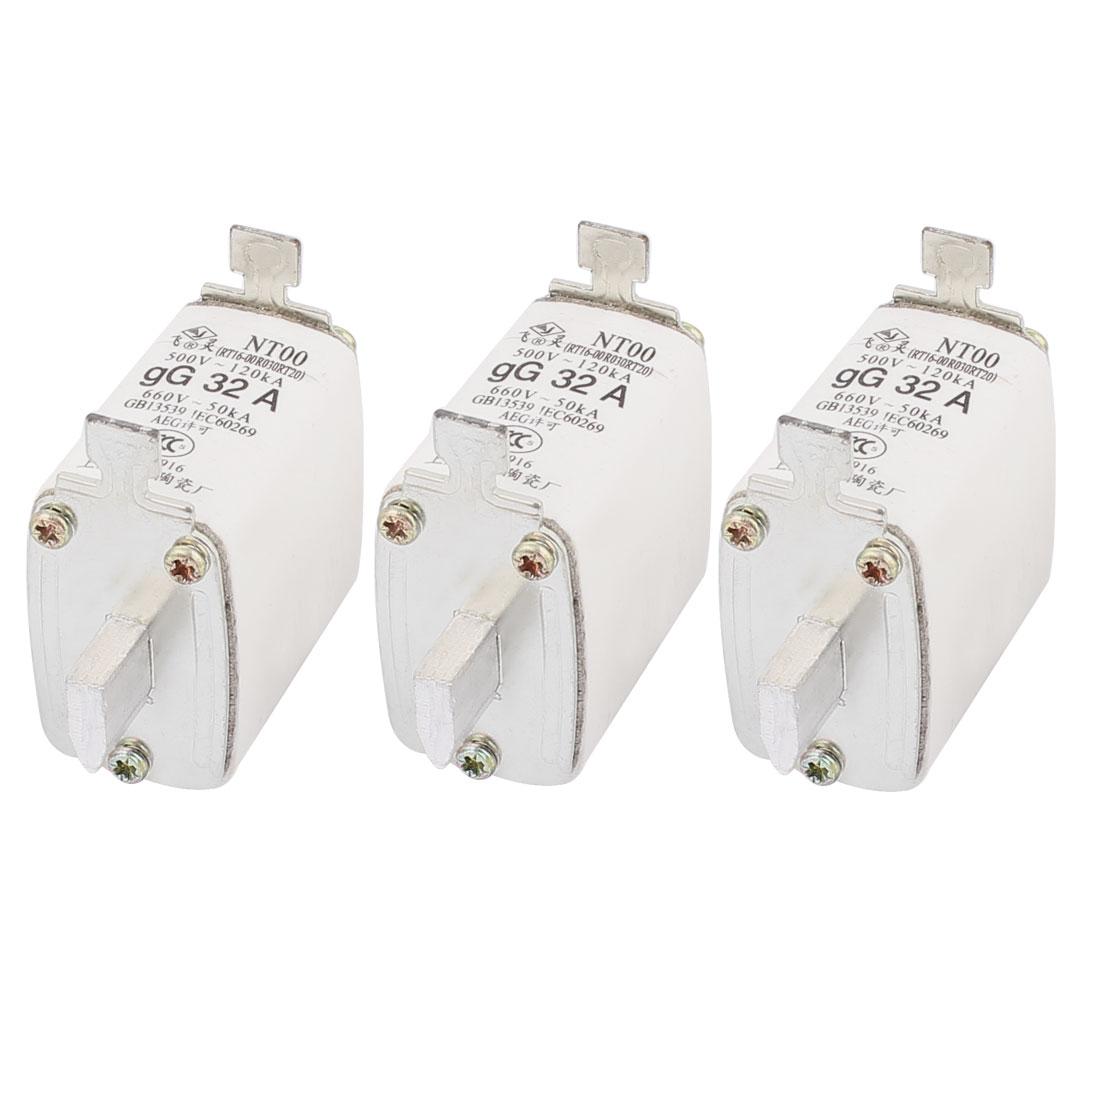 500V 120kA 660V 50kA gG 32A Contact Ceramic Fuse Link NT00 3pcs